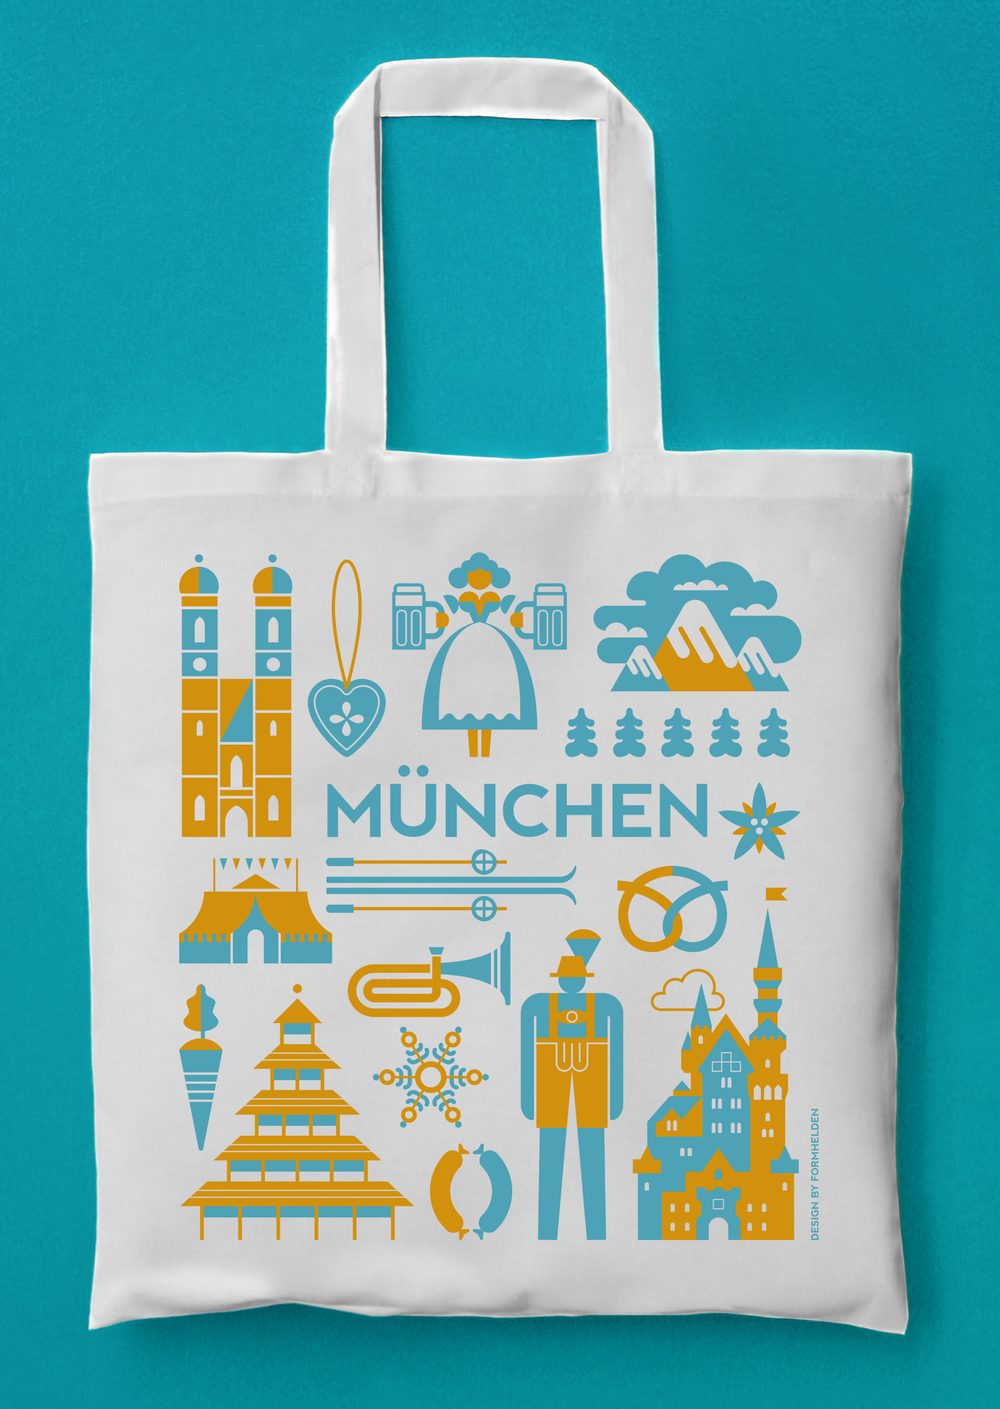 Muenchen_MM.jpg